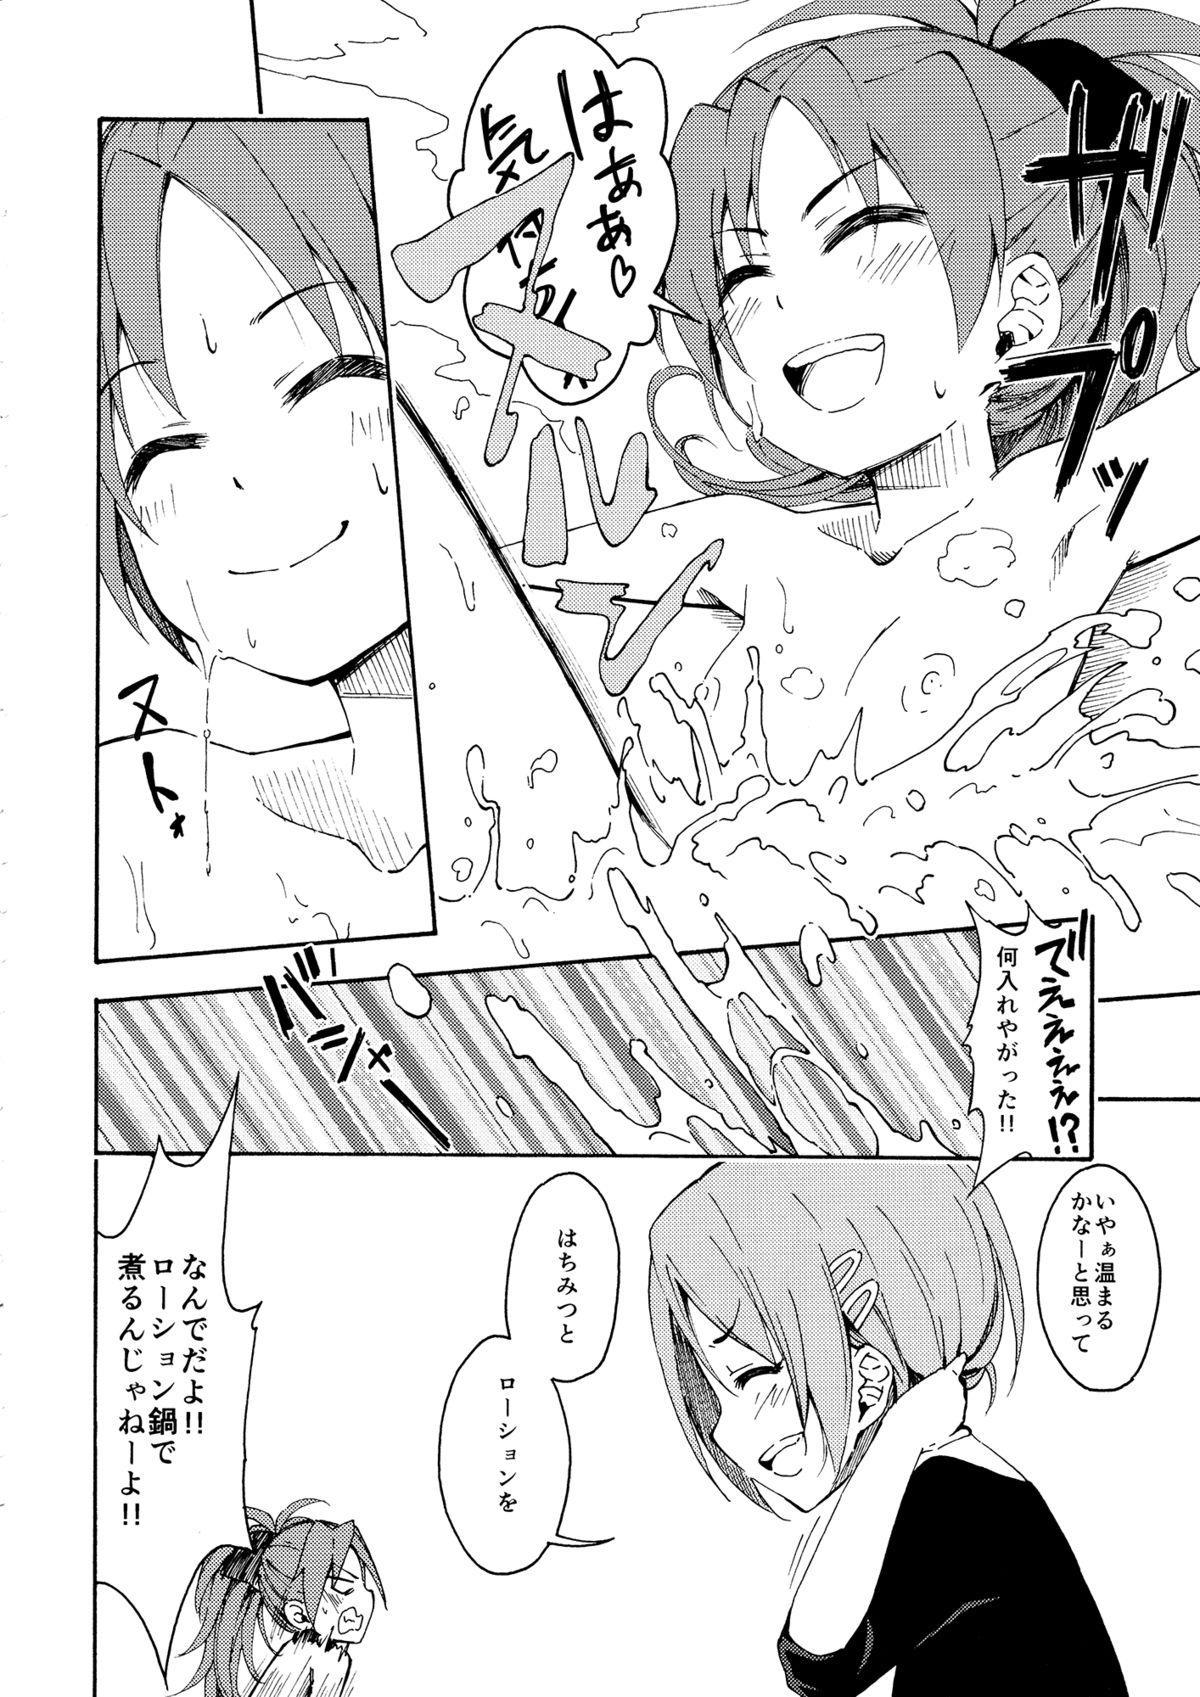 Lovely Girls' Lily Vol. 11 6